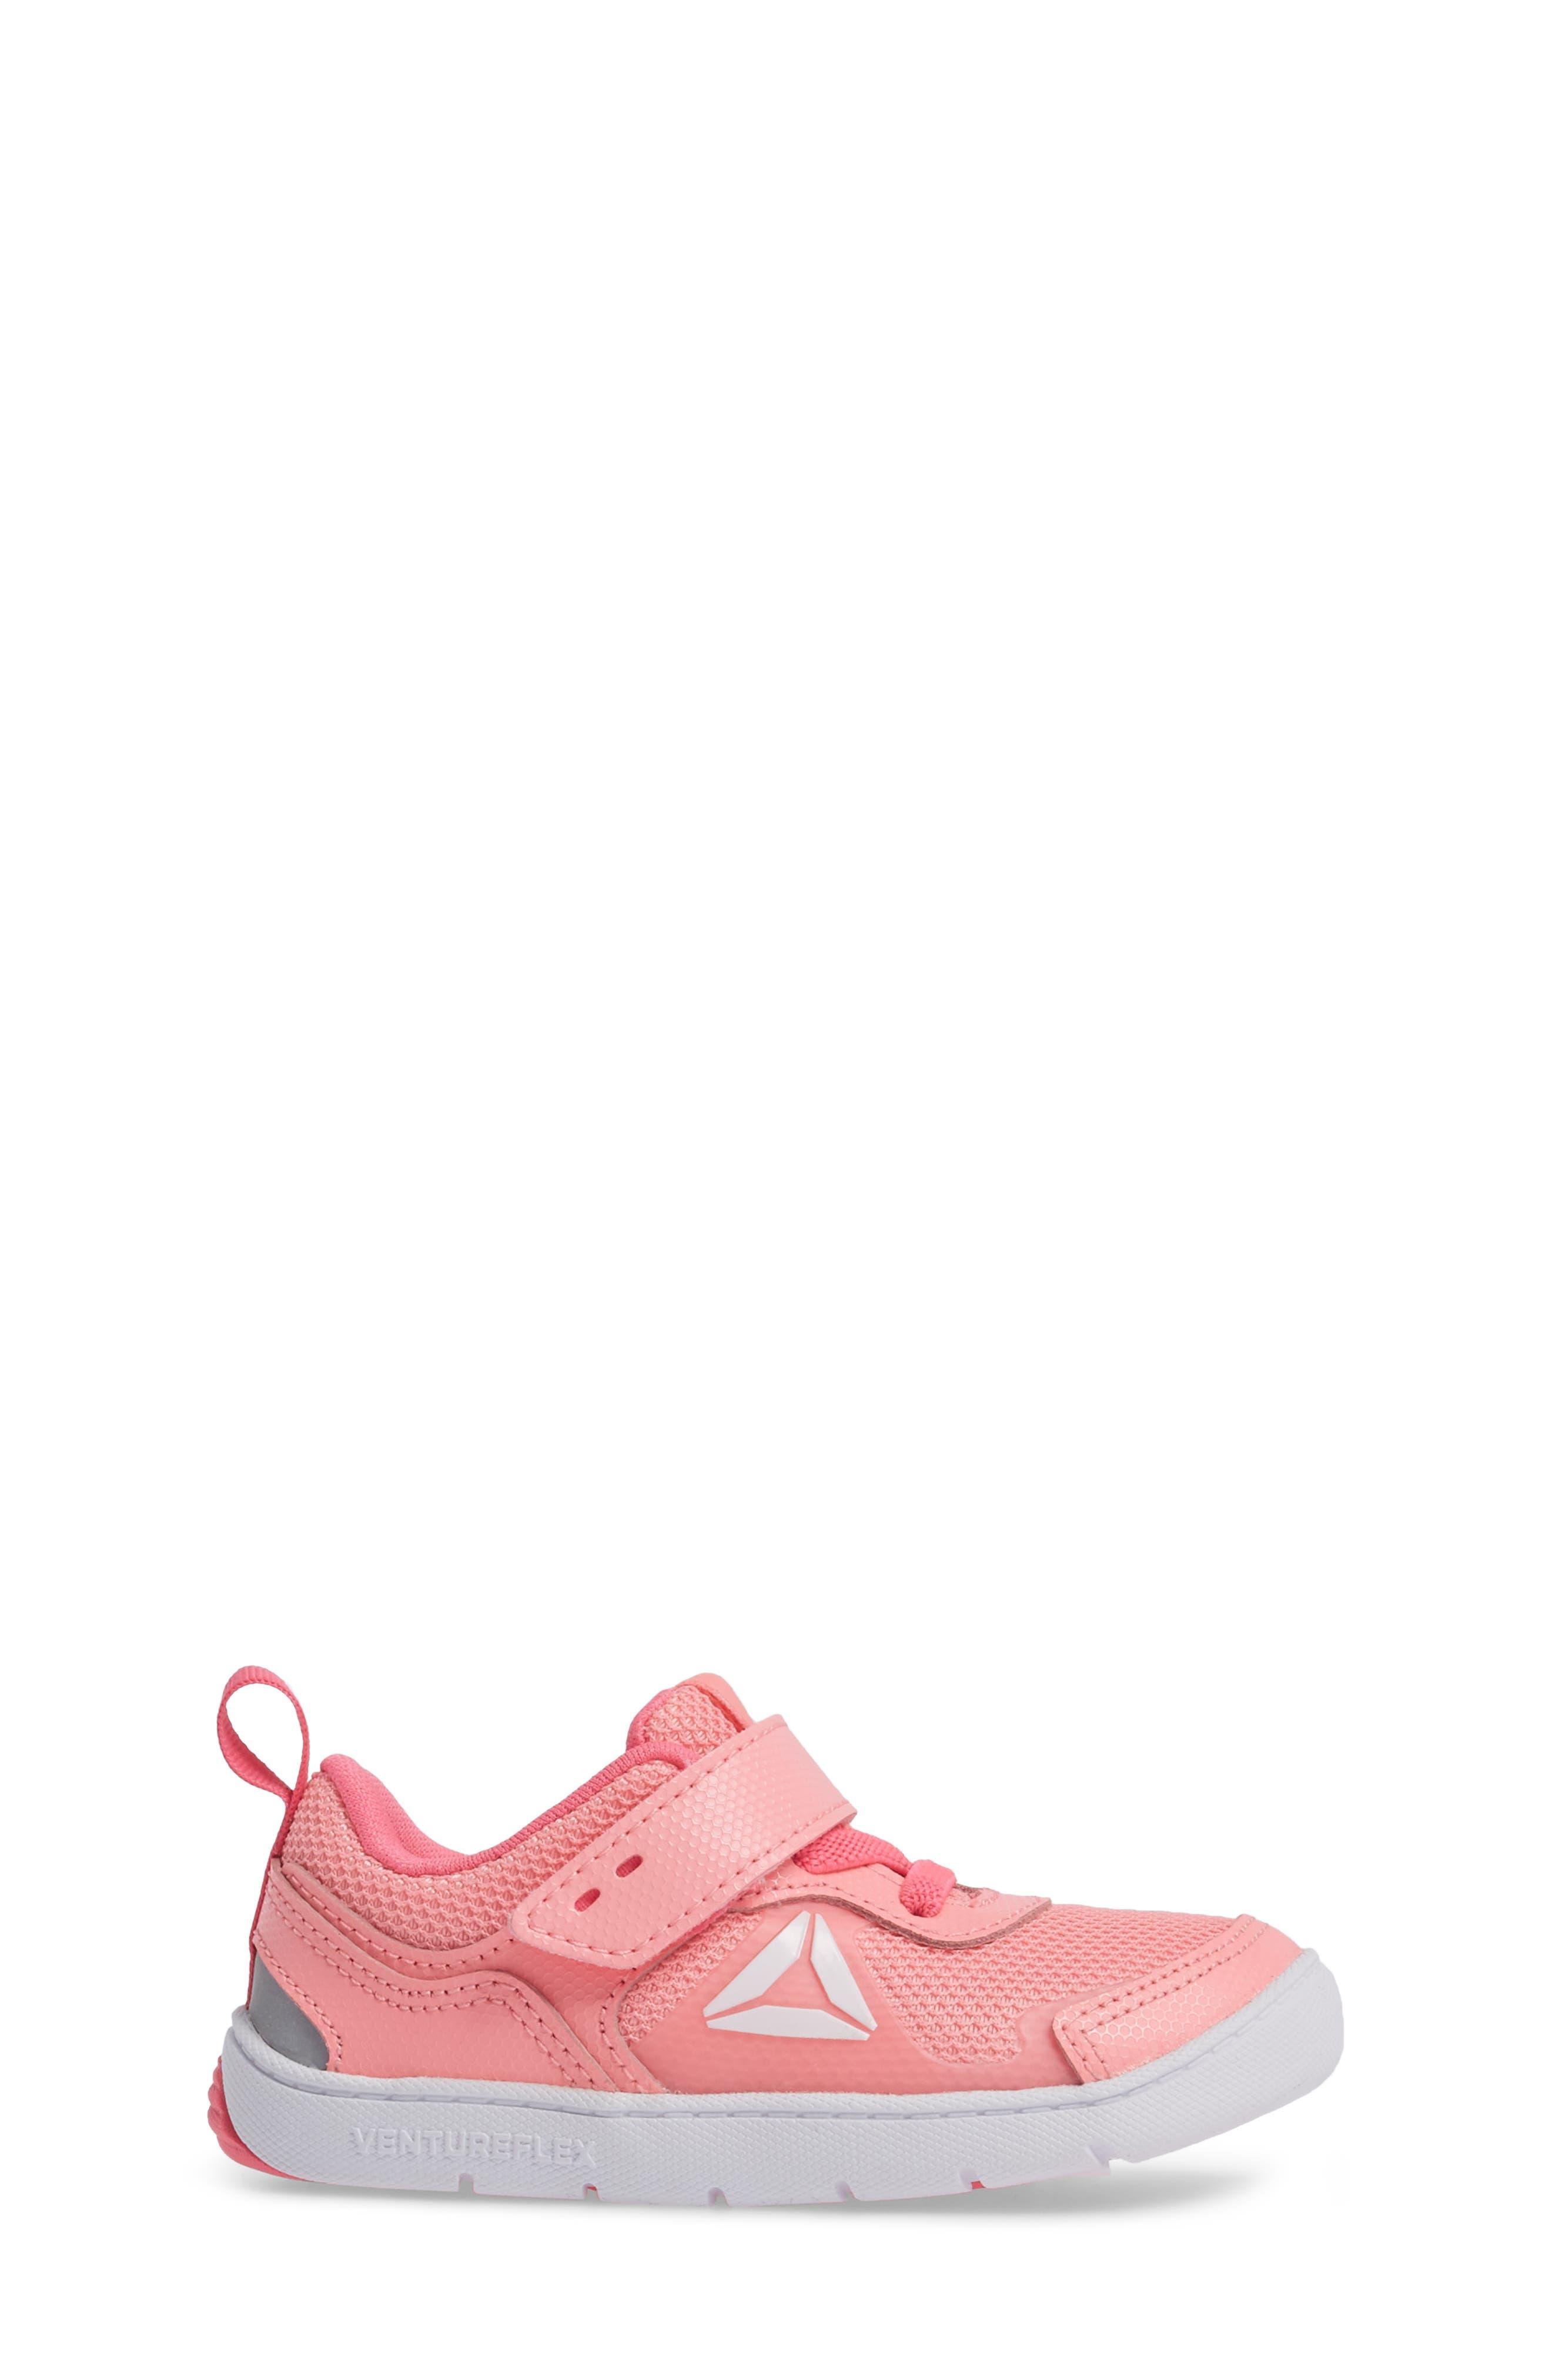 Ventureflex Stride 5.0 Sneaker,                             Alternate thumbnail 6, color,